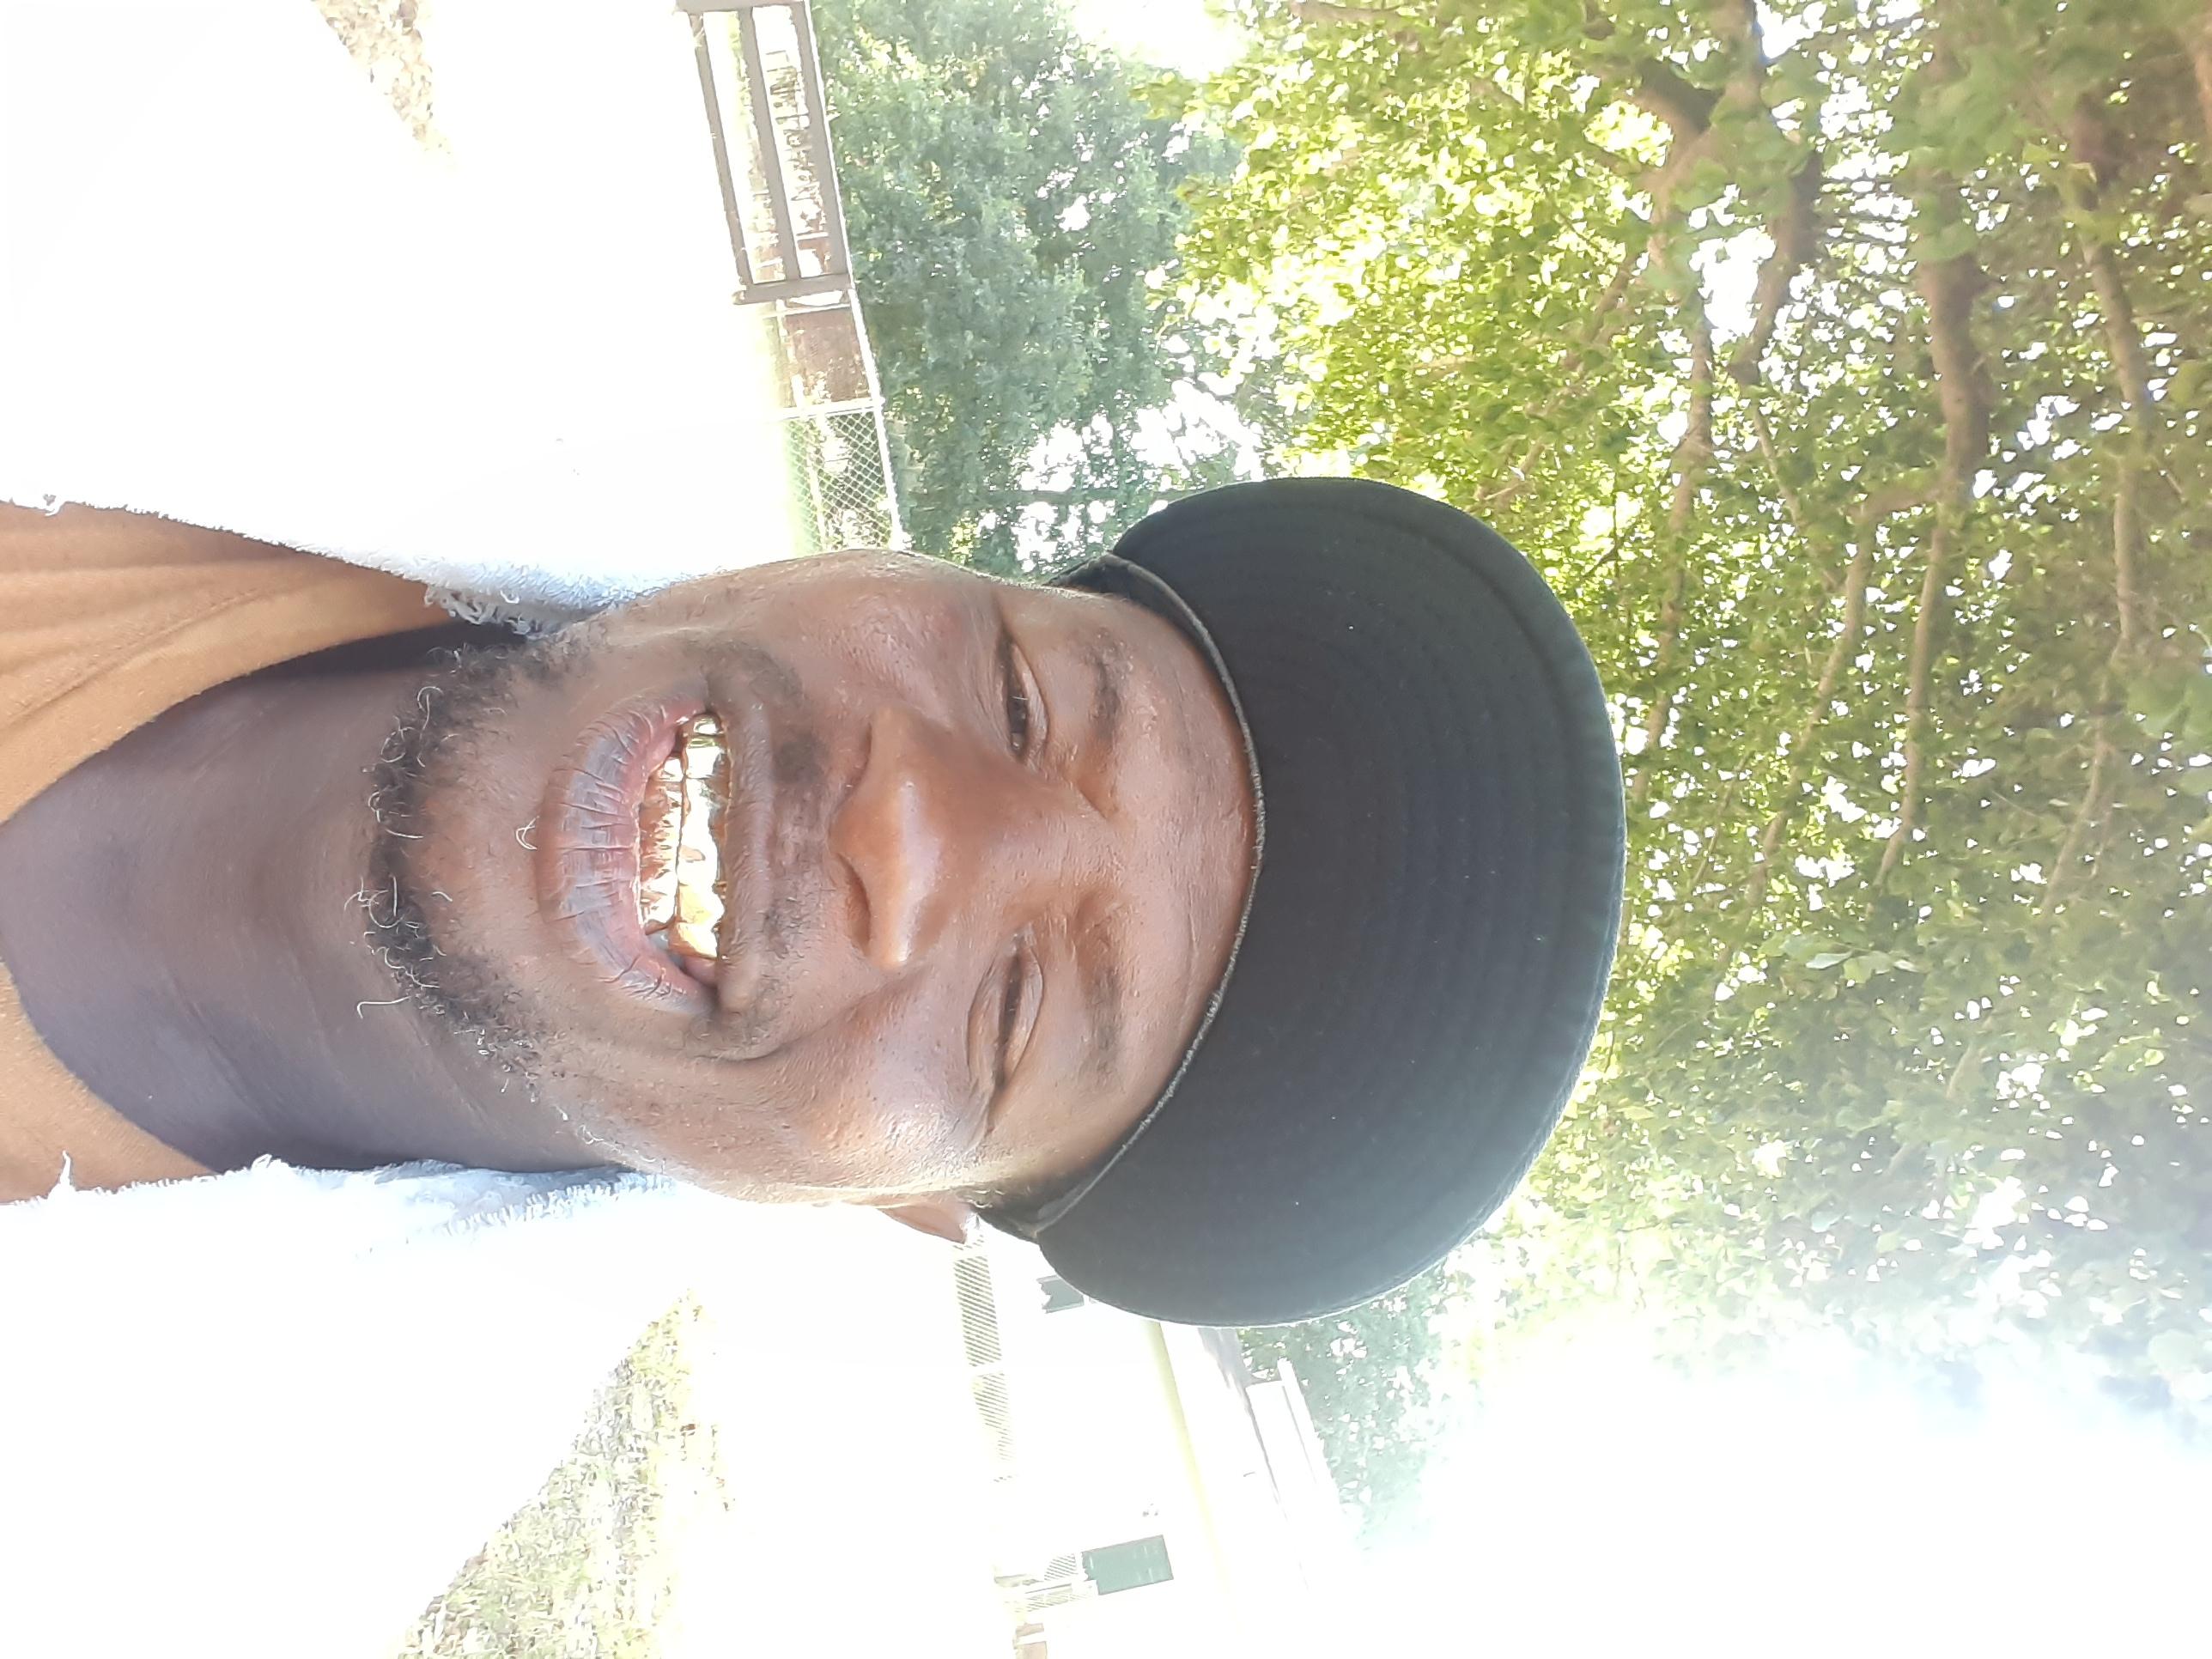 Gospel Artist Donald Harris Spreads God's Love With His Music